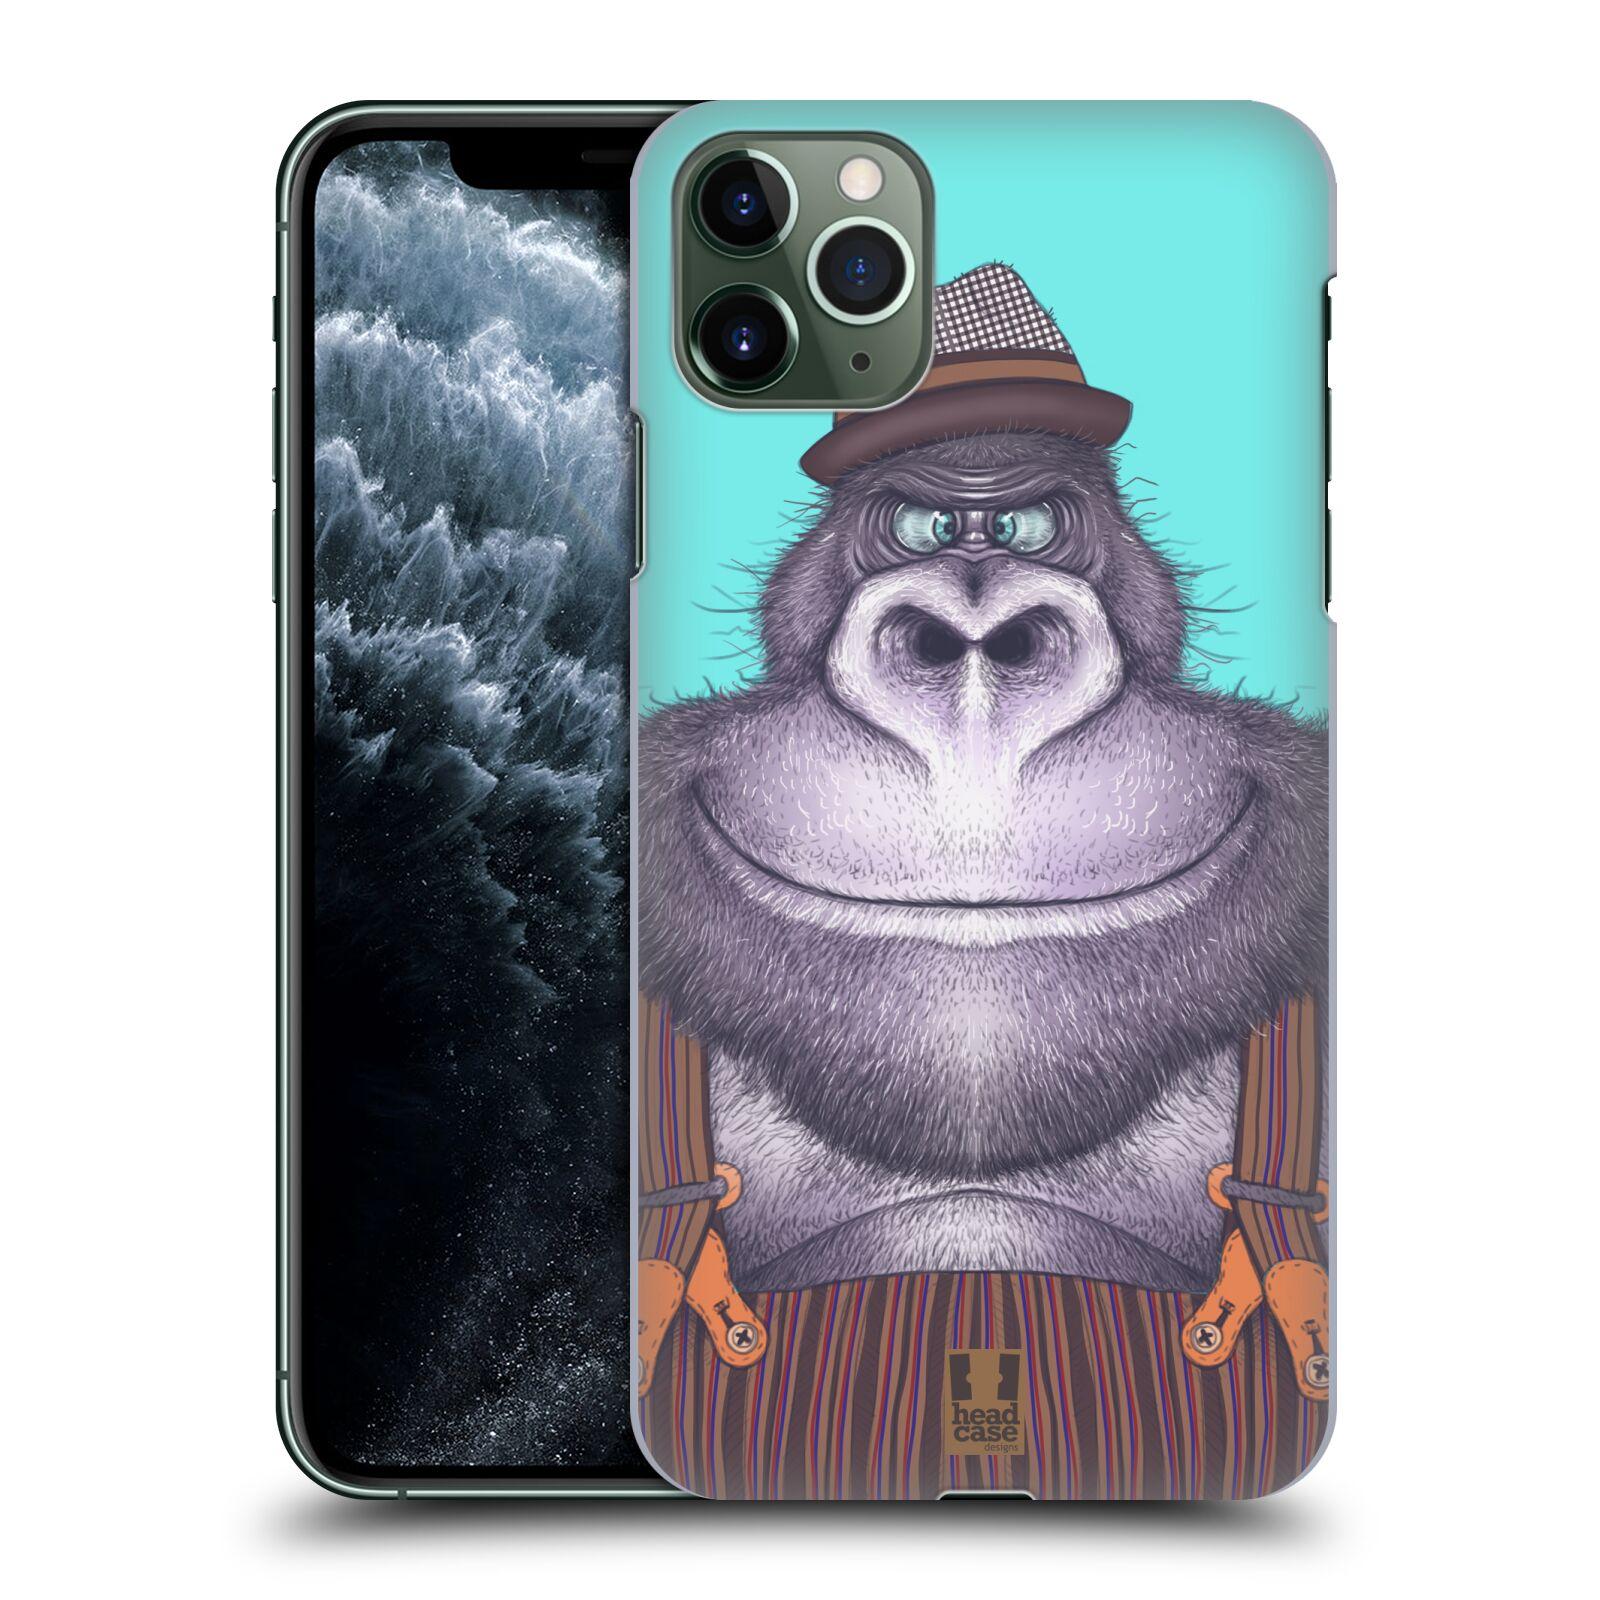 Pouzdro na mobil Apple Iphone 11 PRO MAX - HEAD CASE - vzor Kreslená zvířátka gorila